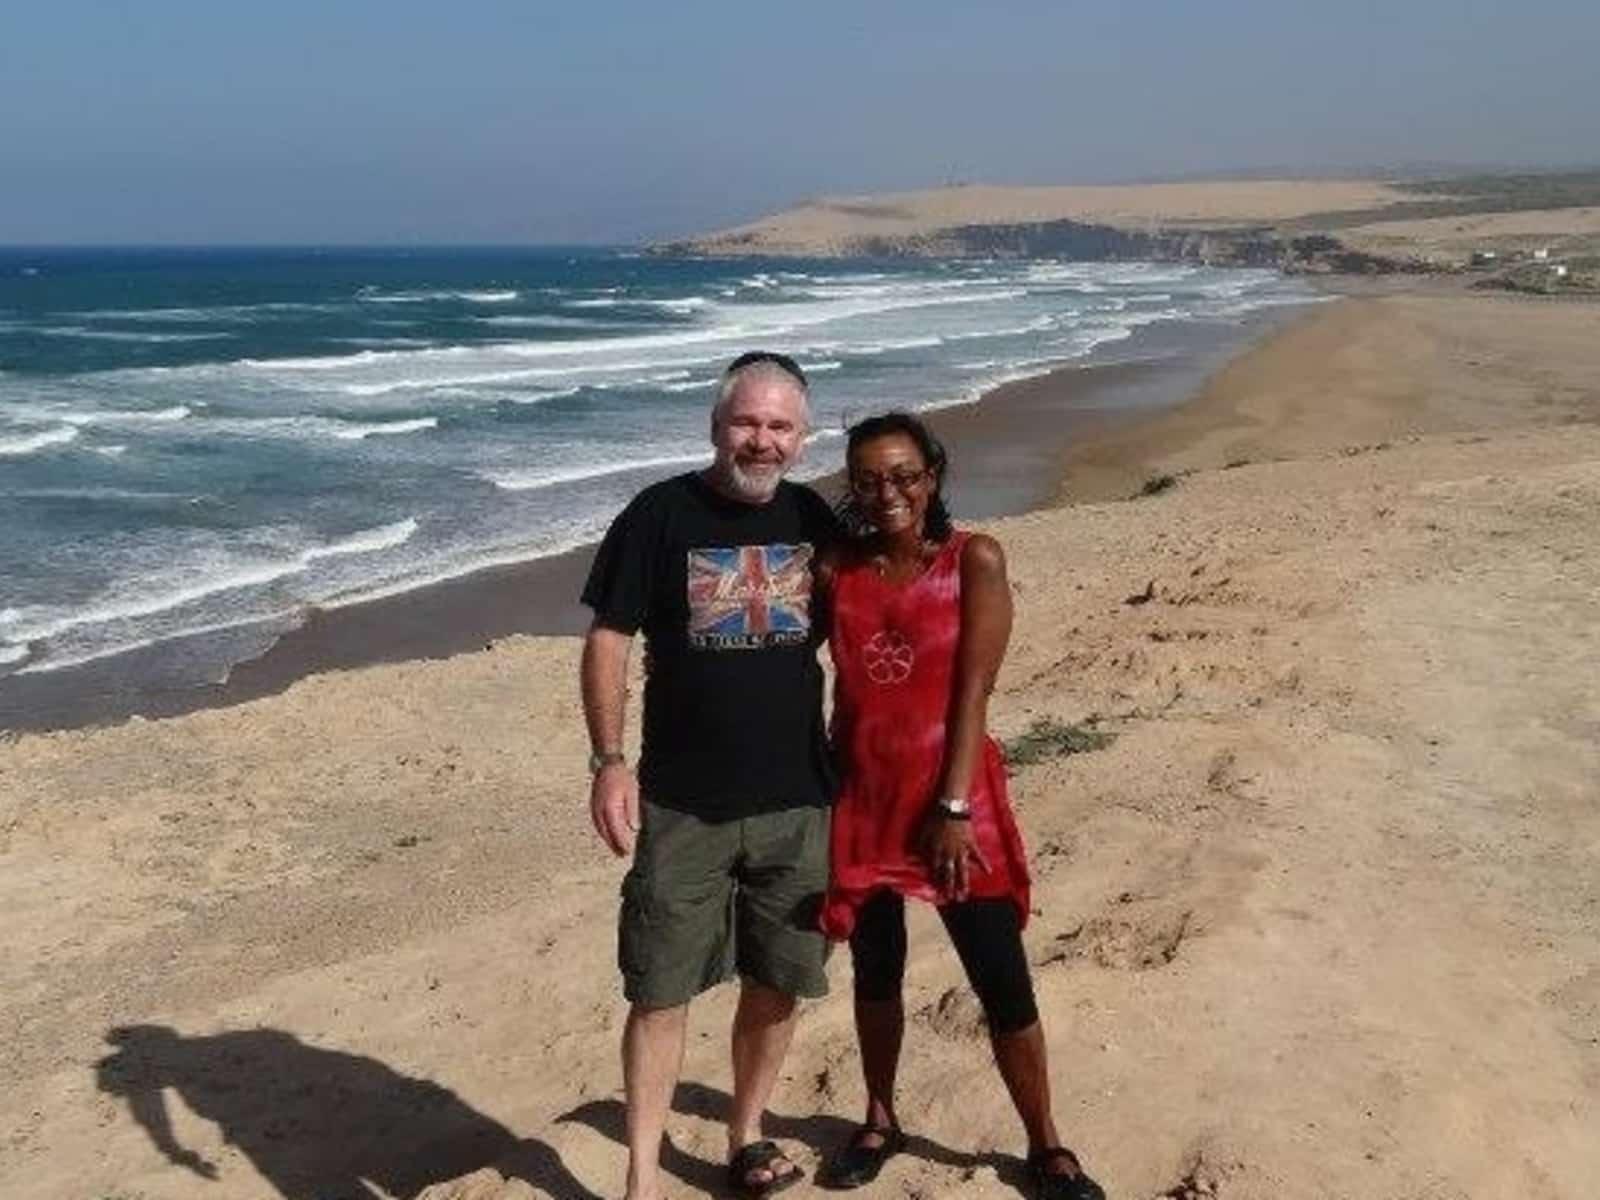 Greg & Naomi from Oliva, Spain